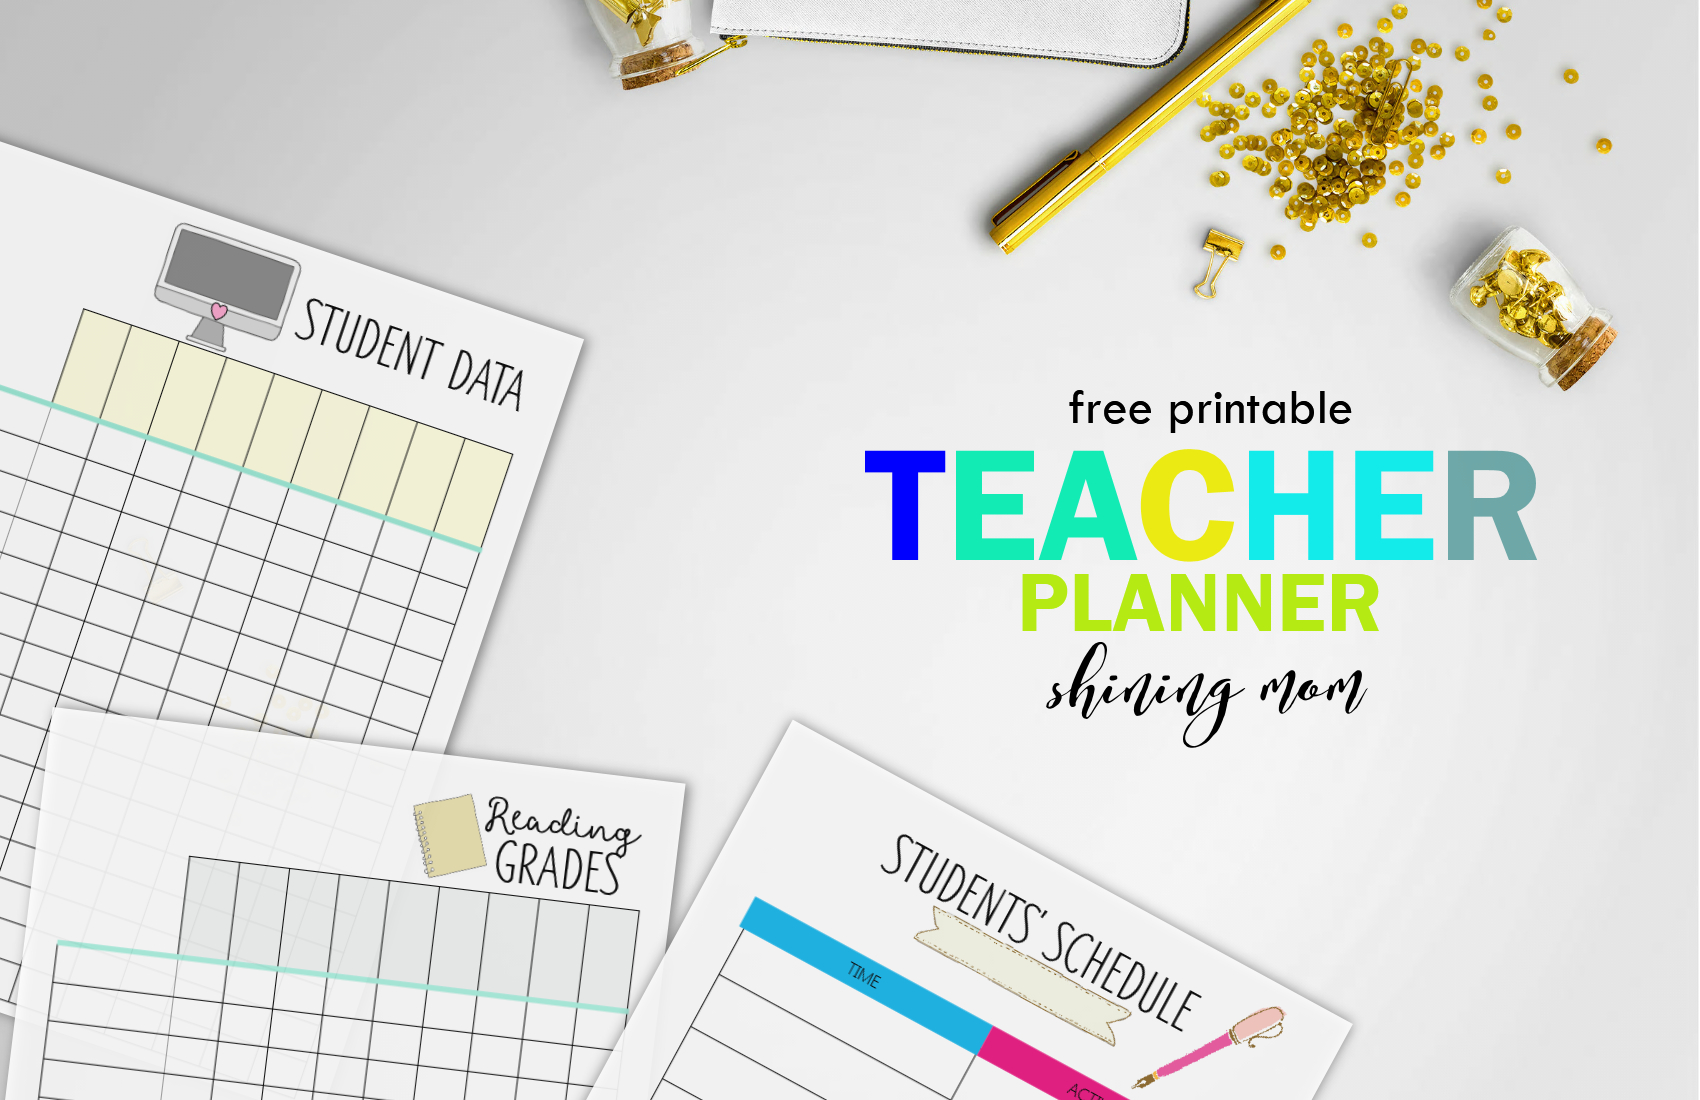 Free Teacher Binder Printables: Over 25 Pretty Planning Templates! - Printable Teacher Planner Free